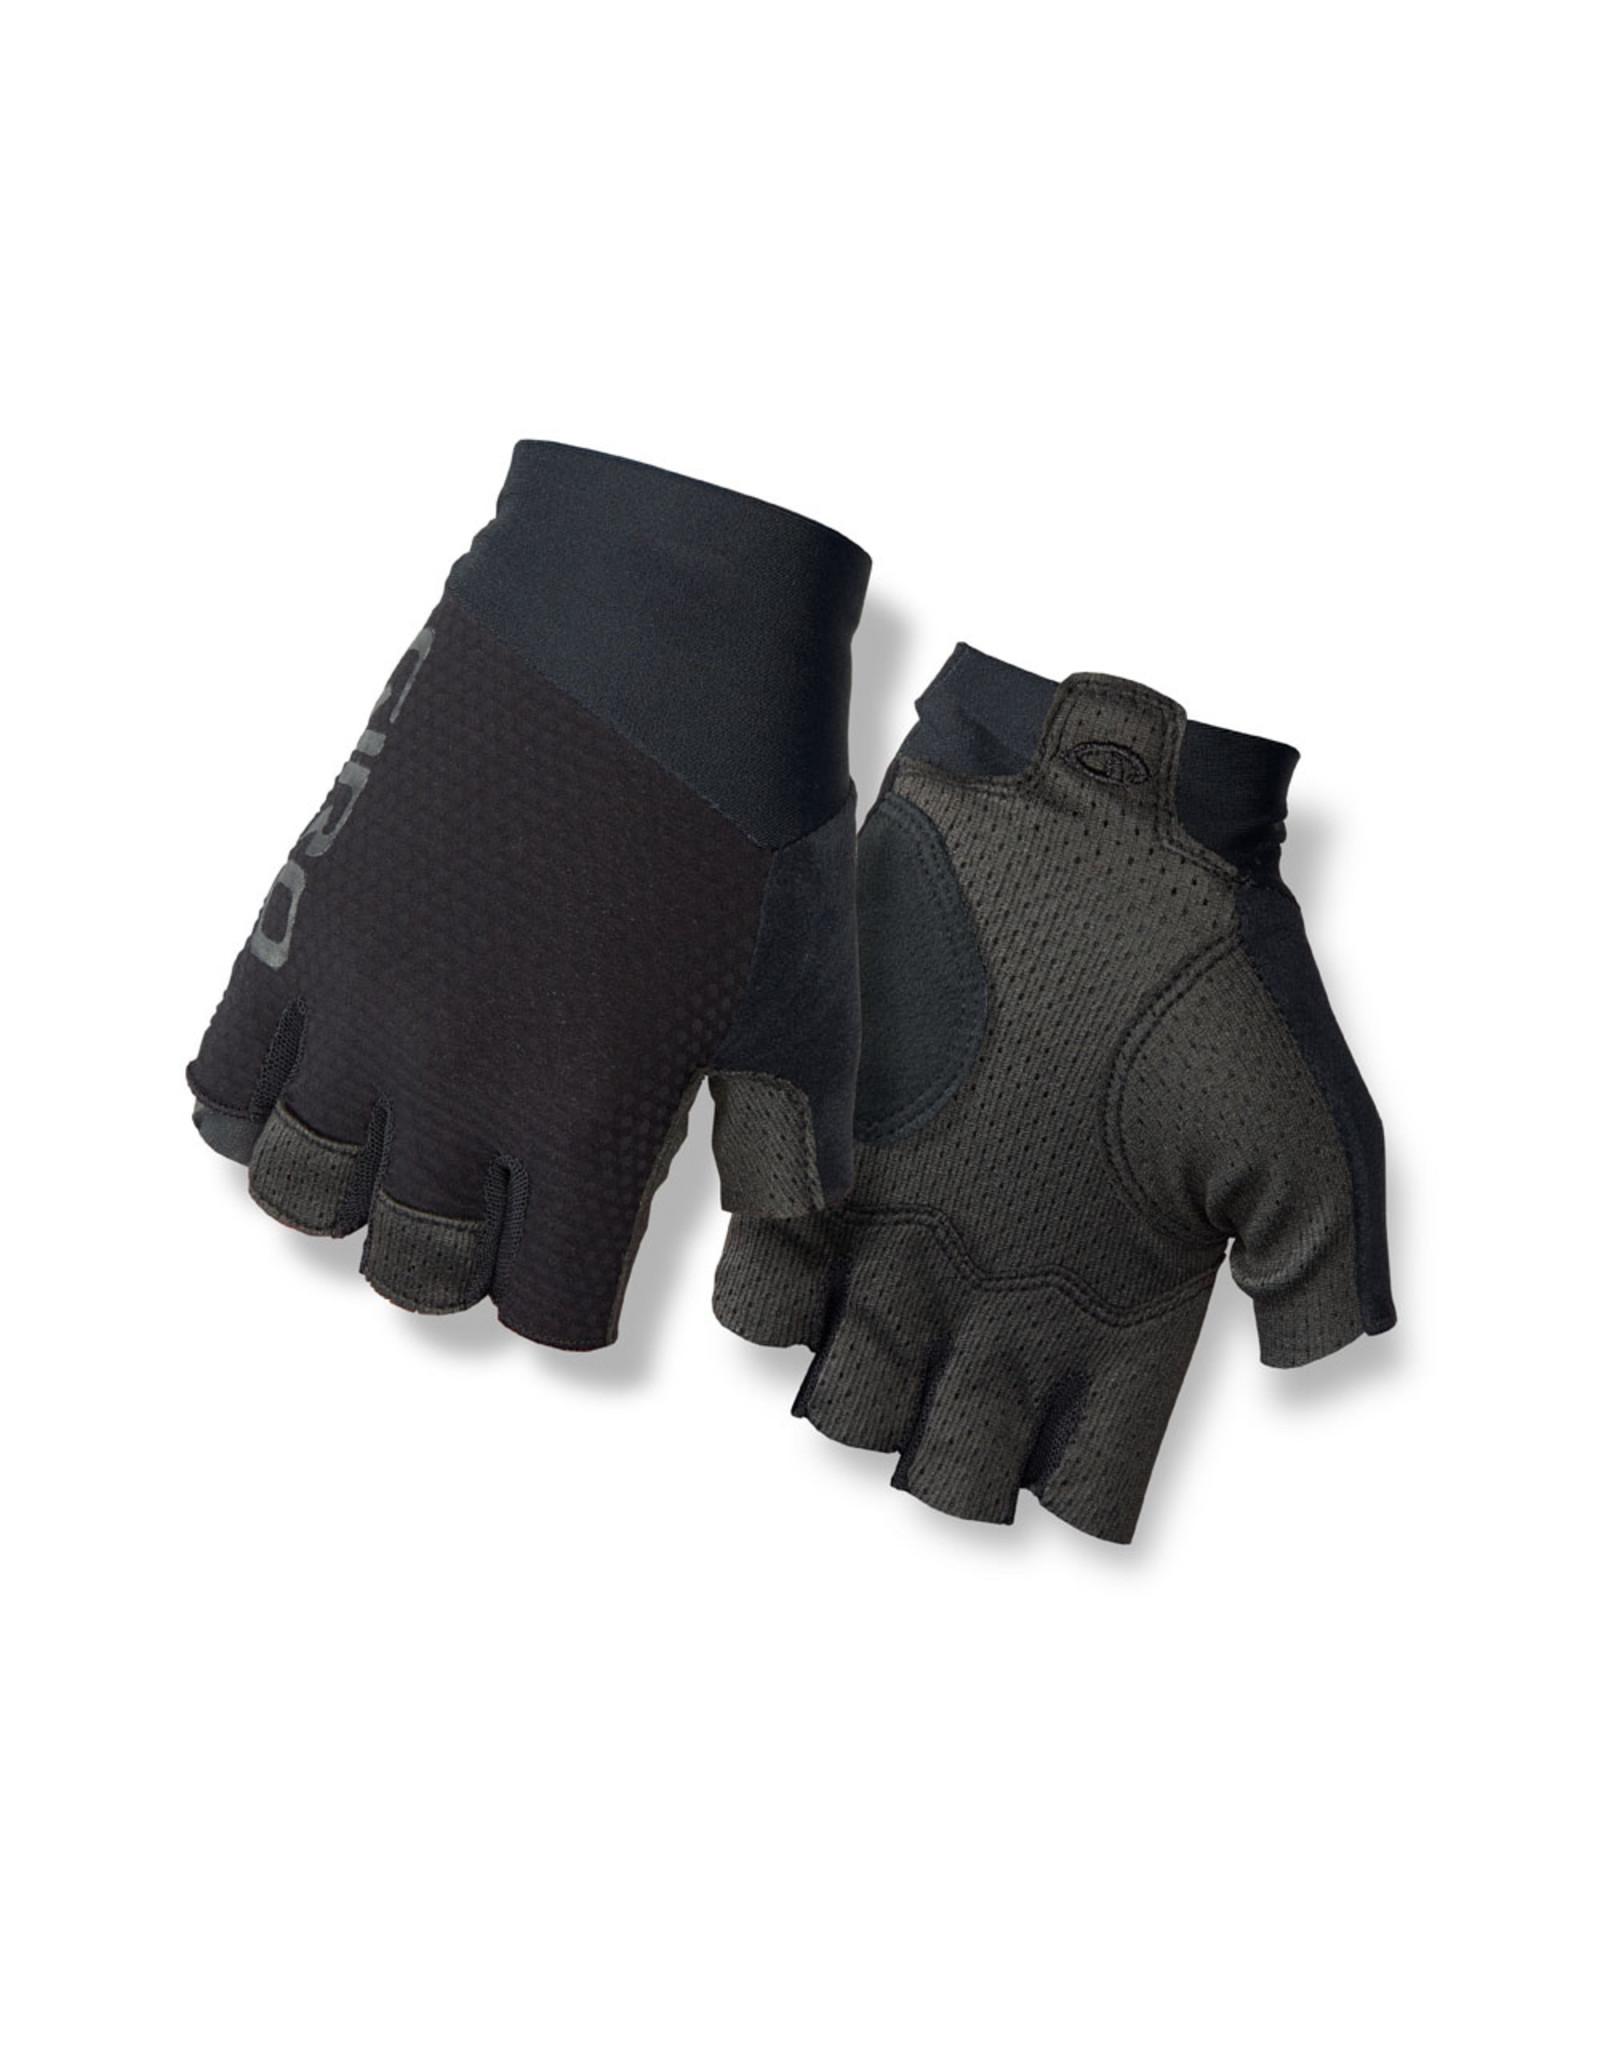 Giro Cycling GIRO, Glove, Zero CS